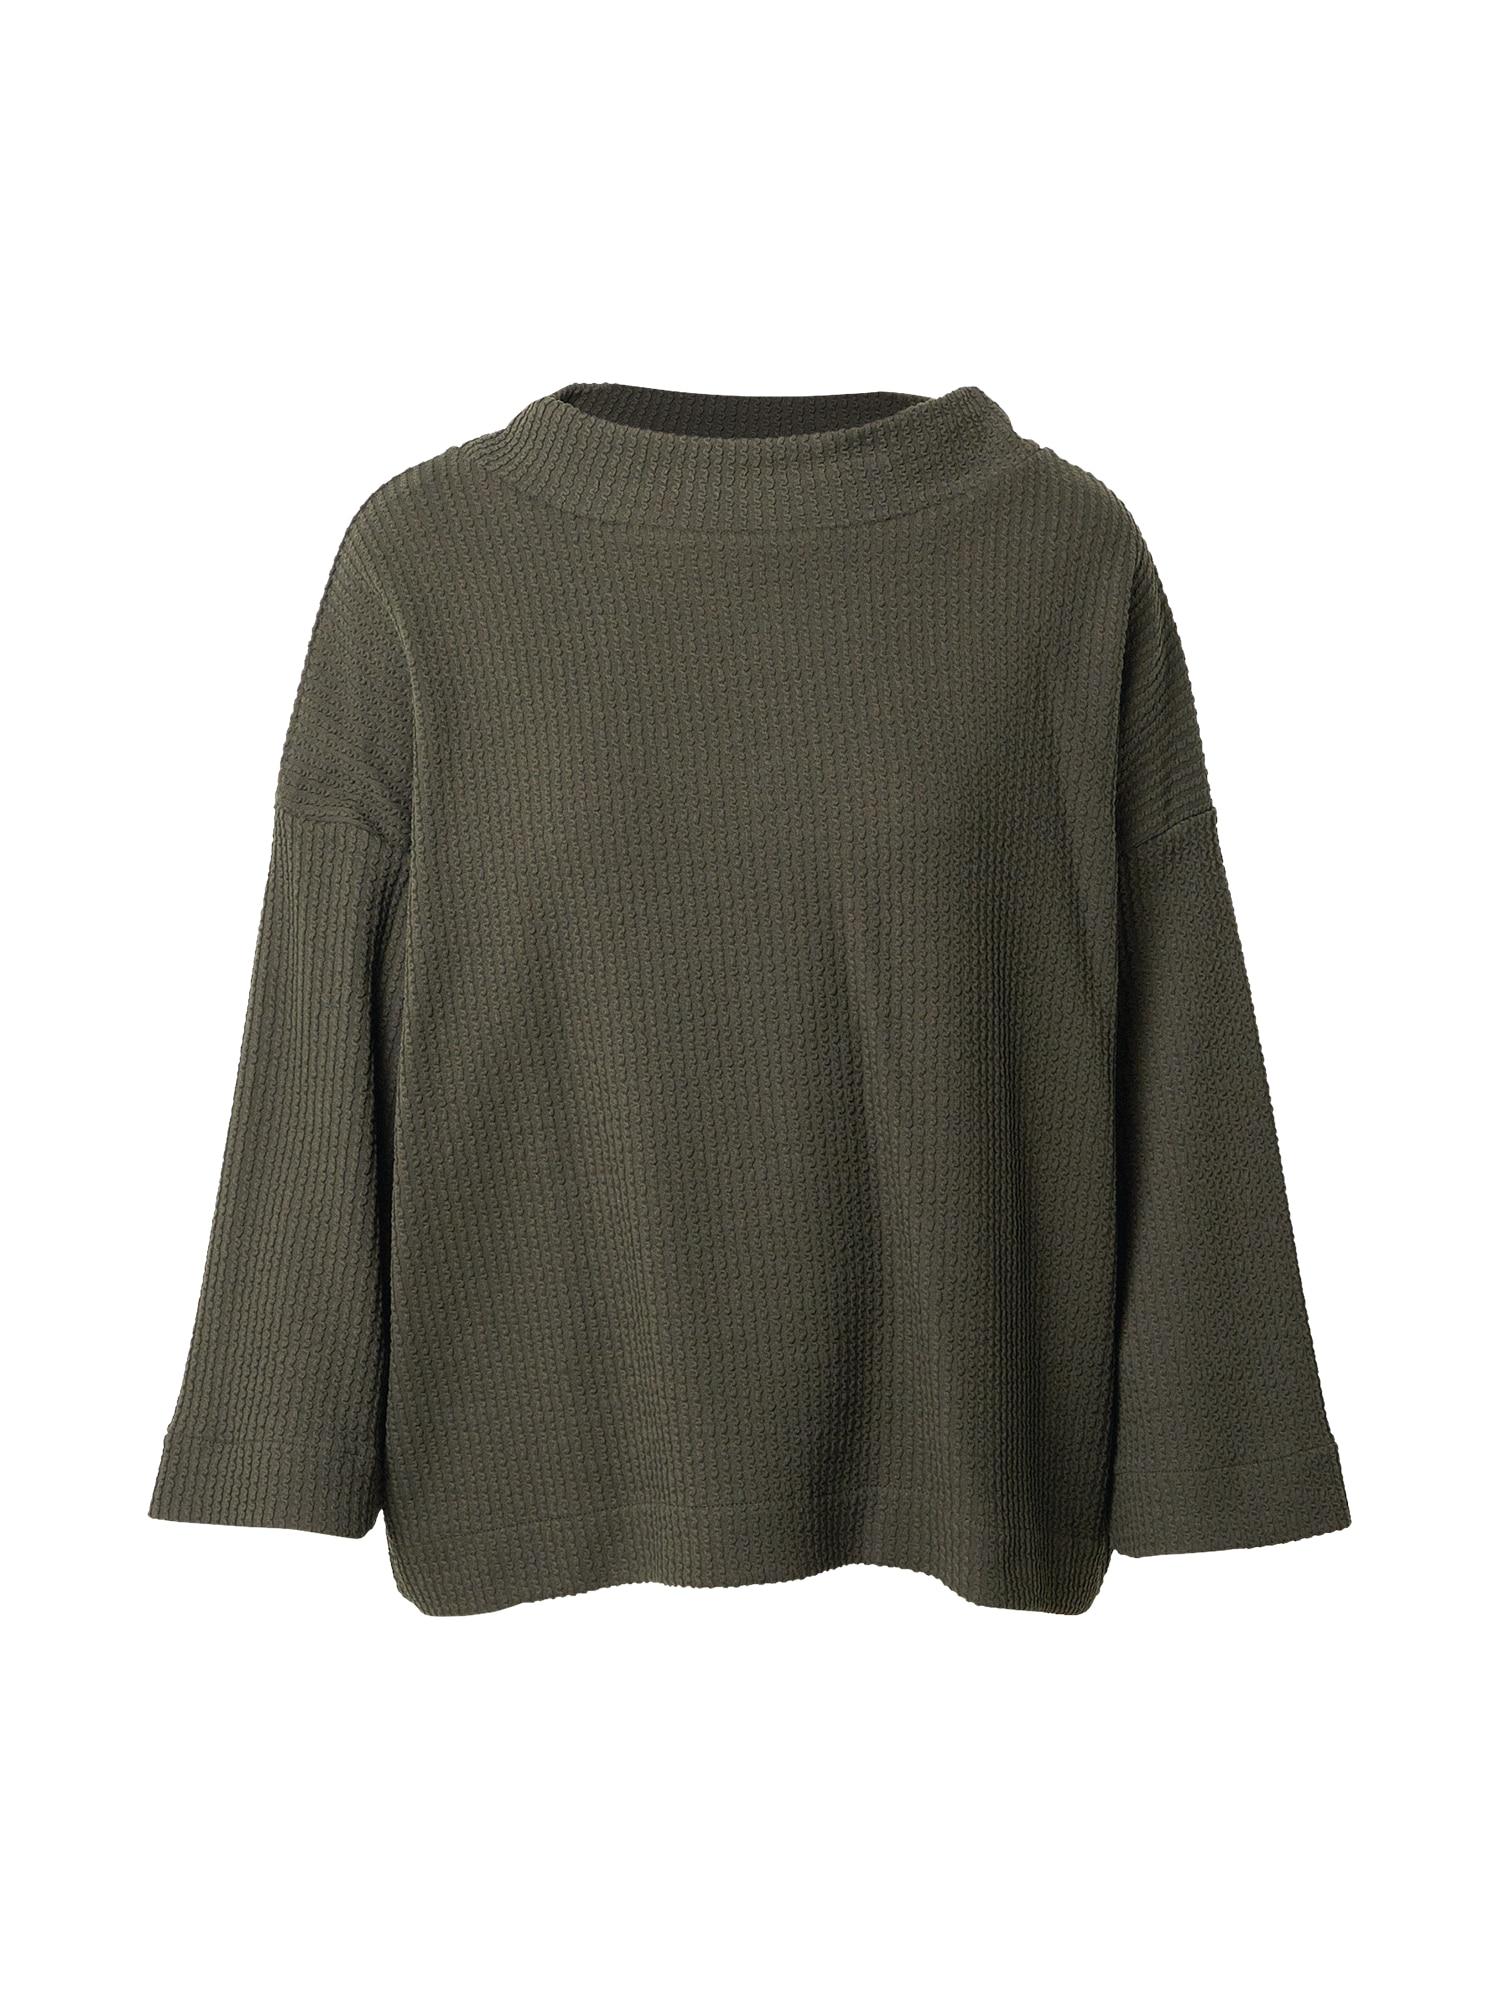 JAN 'N JUNE Megztinis alyvuogių spalva